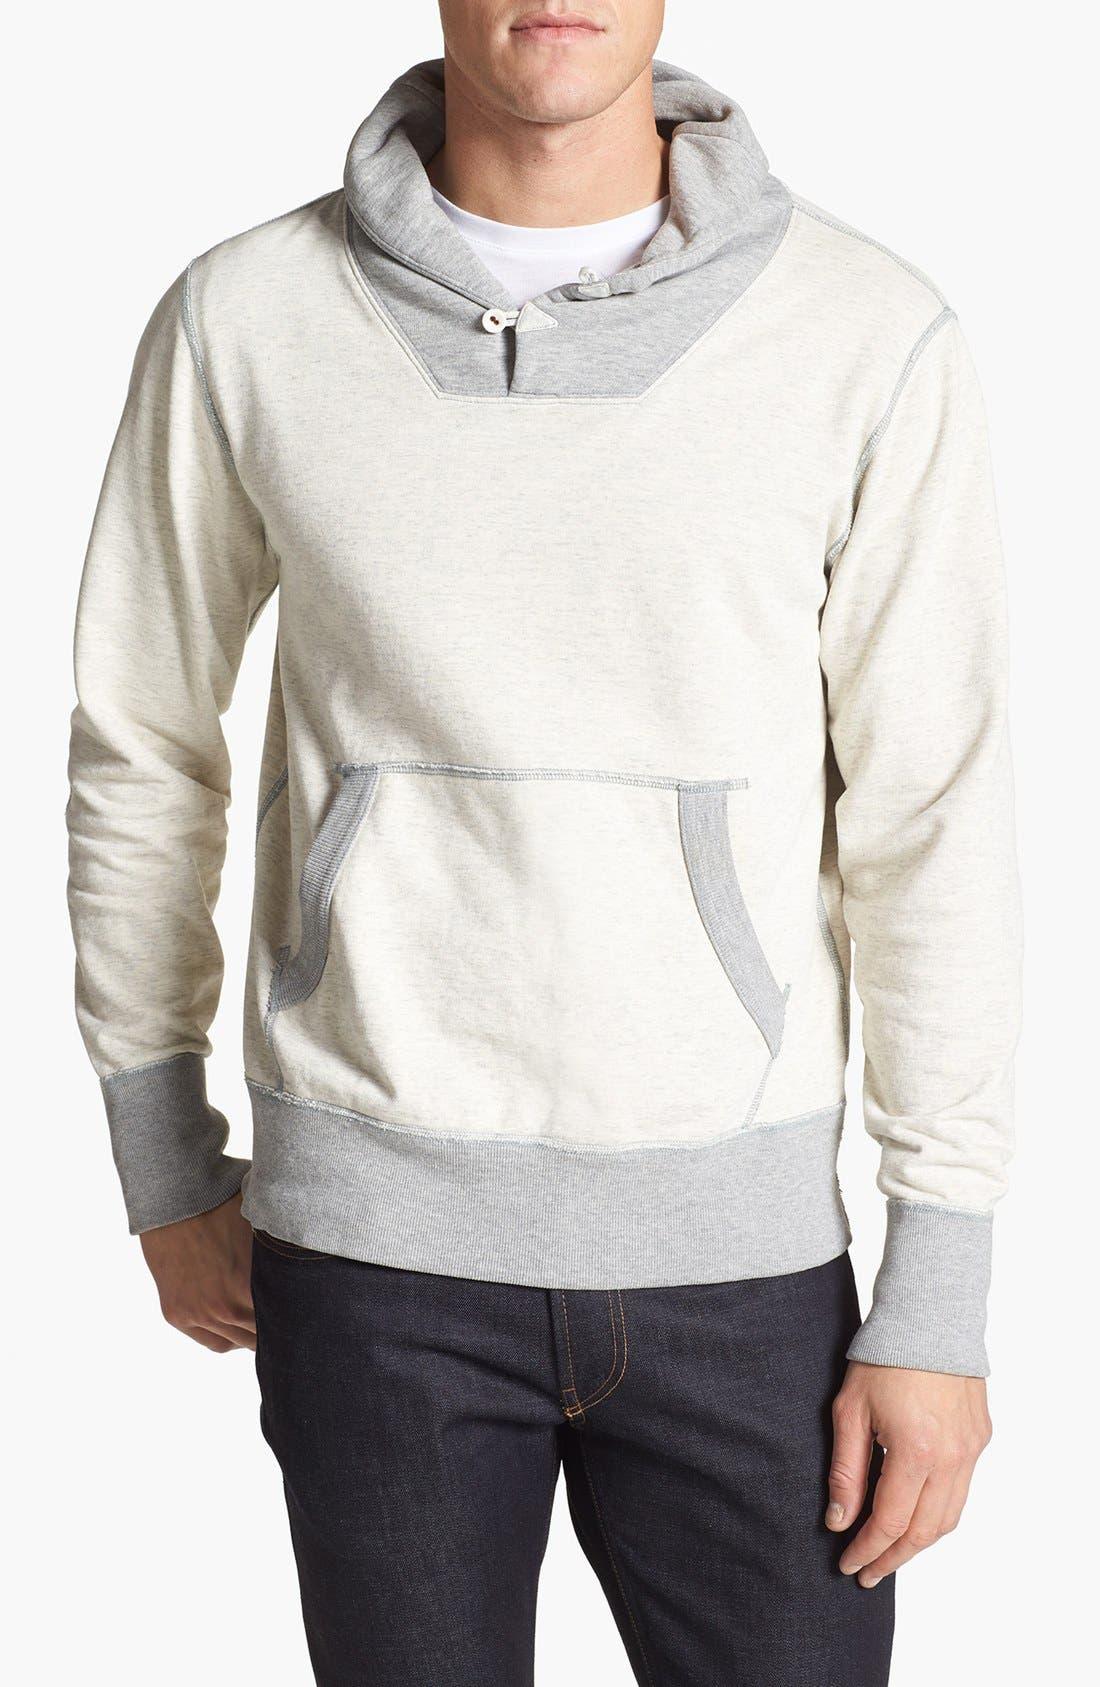 TODD SNYDER + CHAMPION Shawl Collar Sweatshirt, Main, color, 050